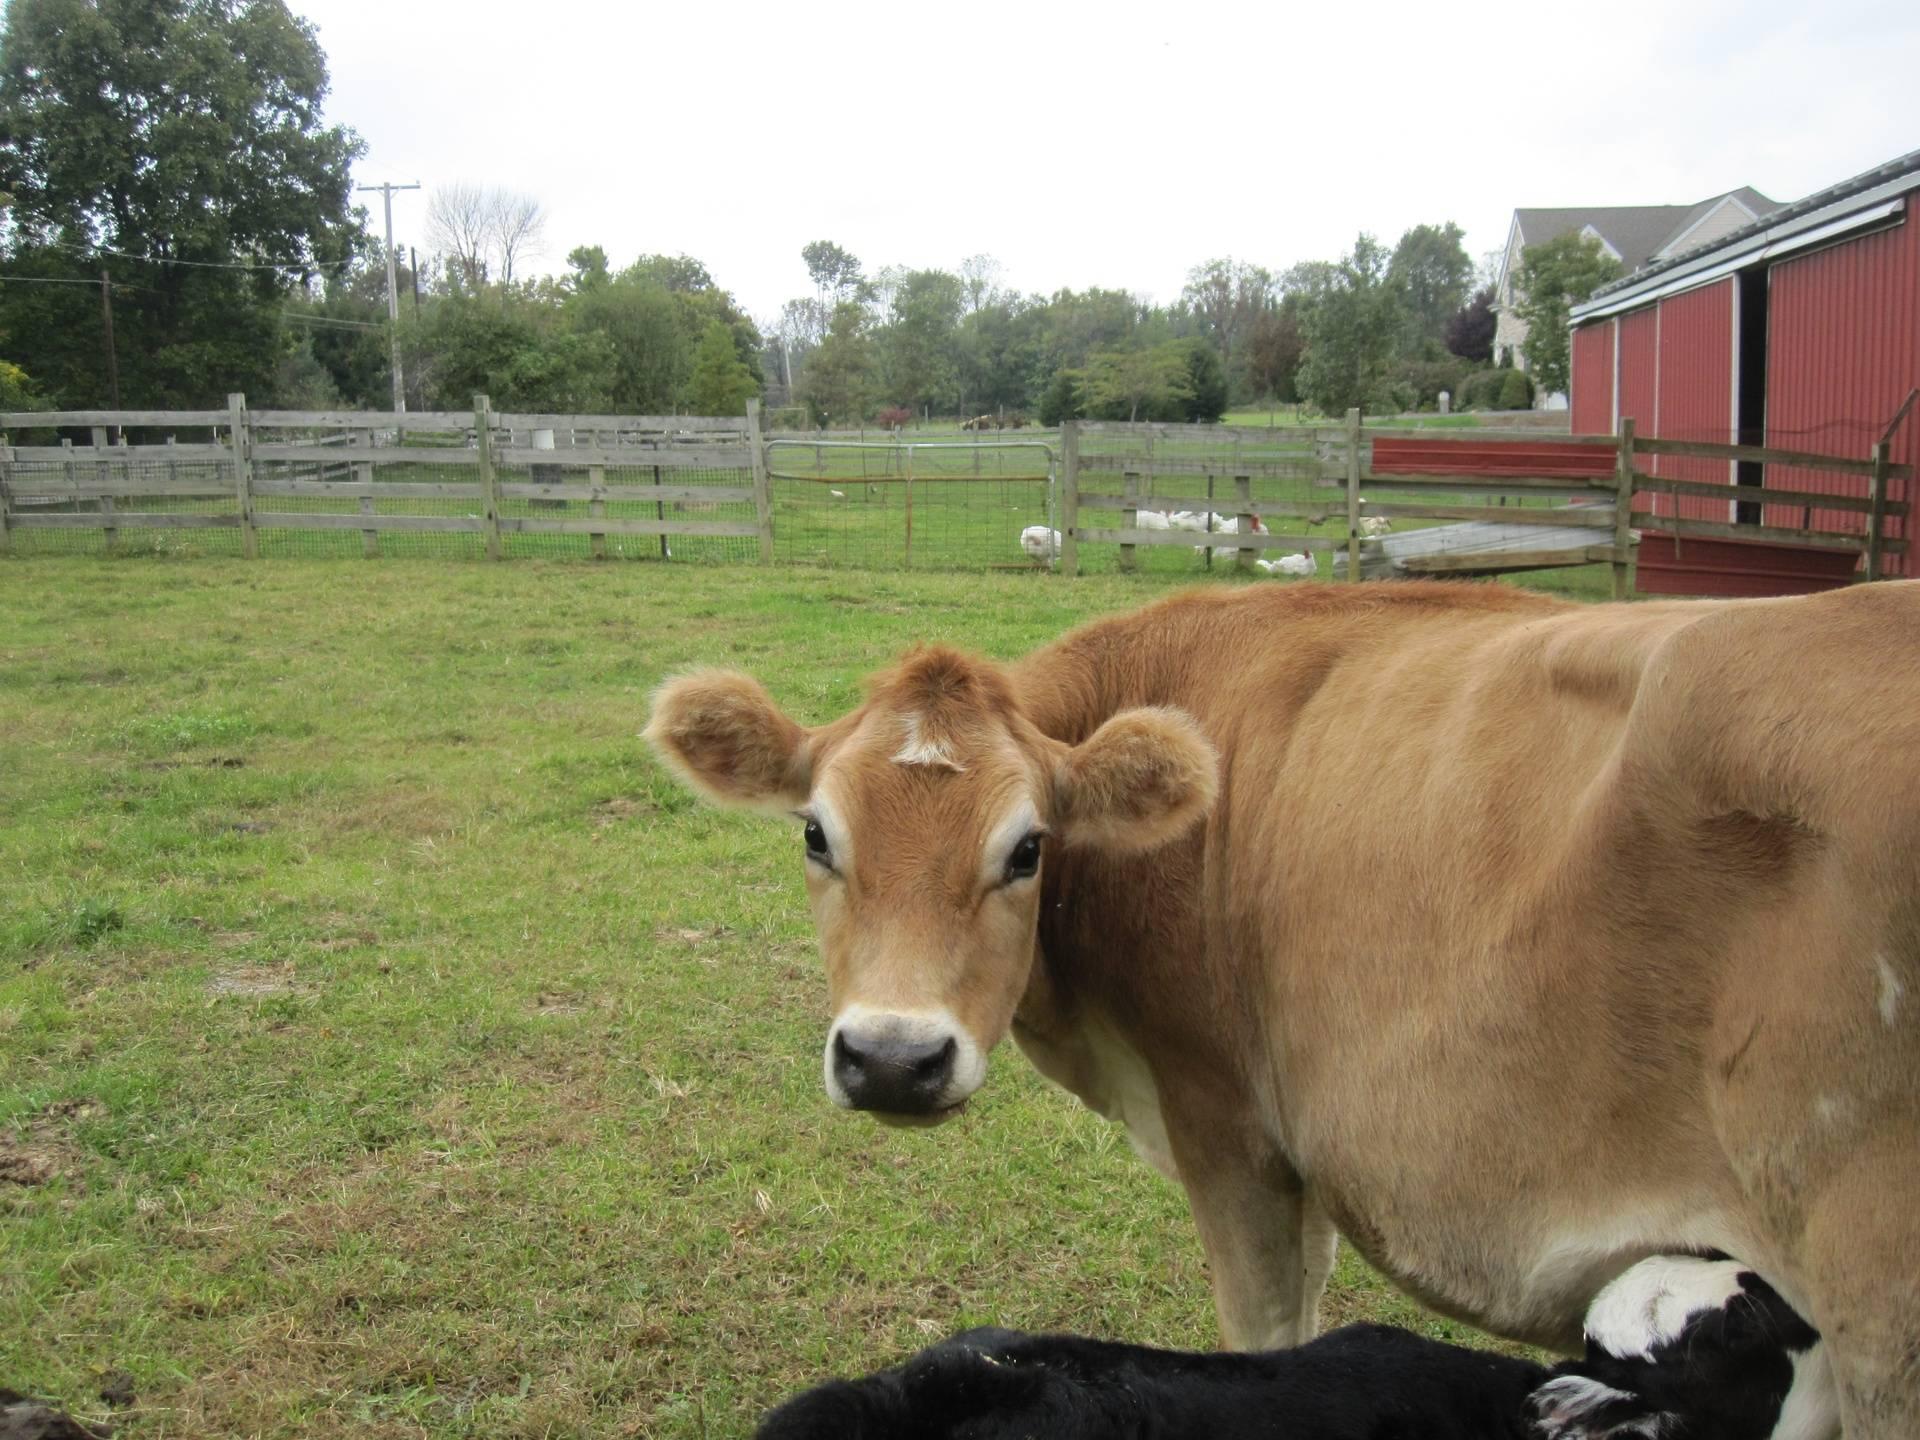 Jaklamas Farmstand, 260 Myler Road, Bloomsbury, NJ, 08804, USA